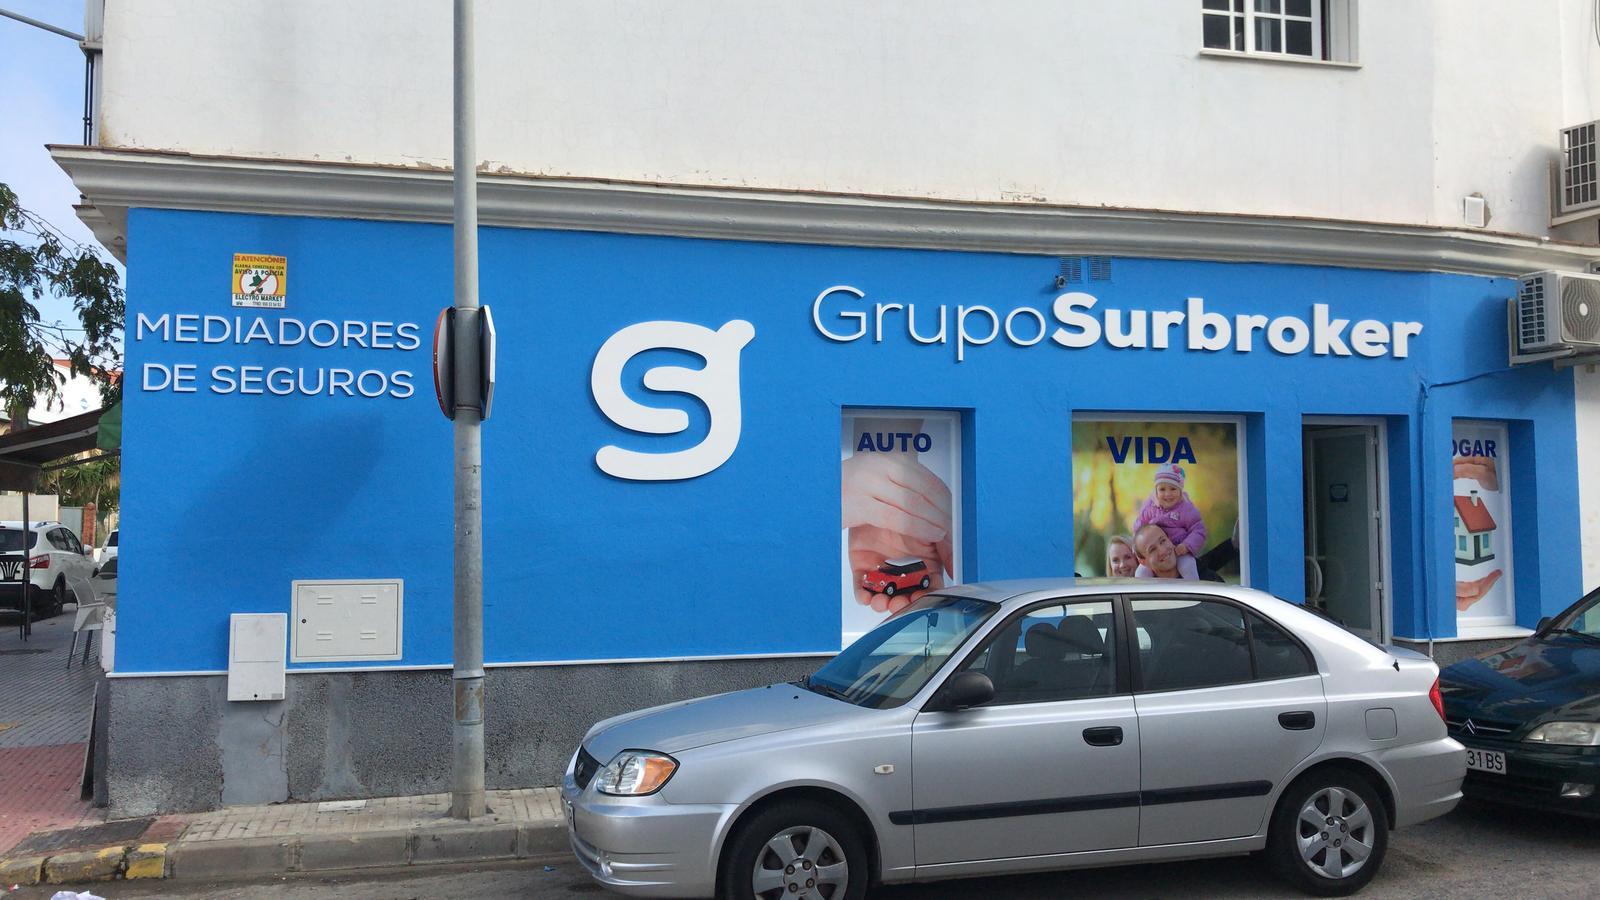 Oficina Grupo Surbroker Chiclana